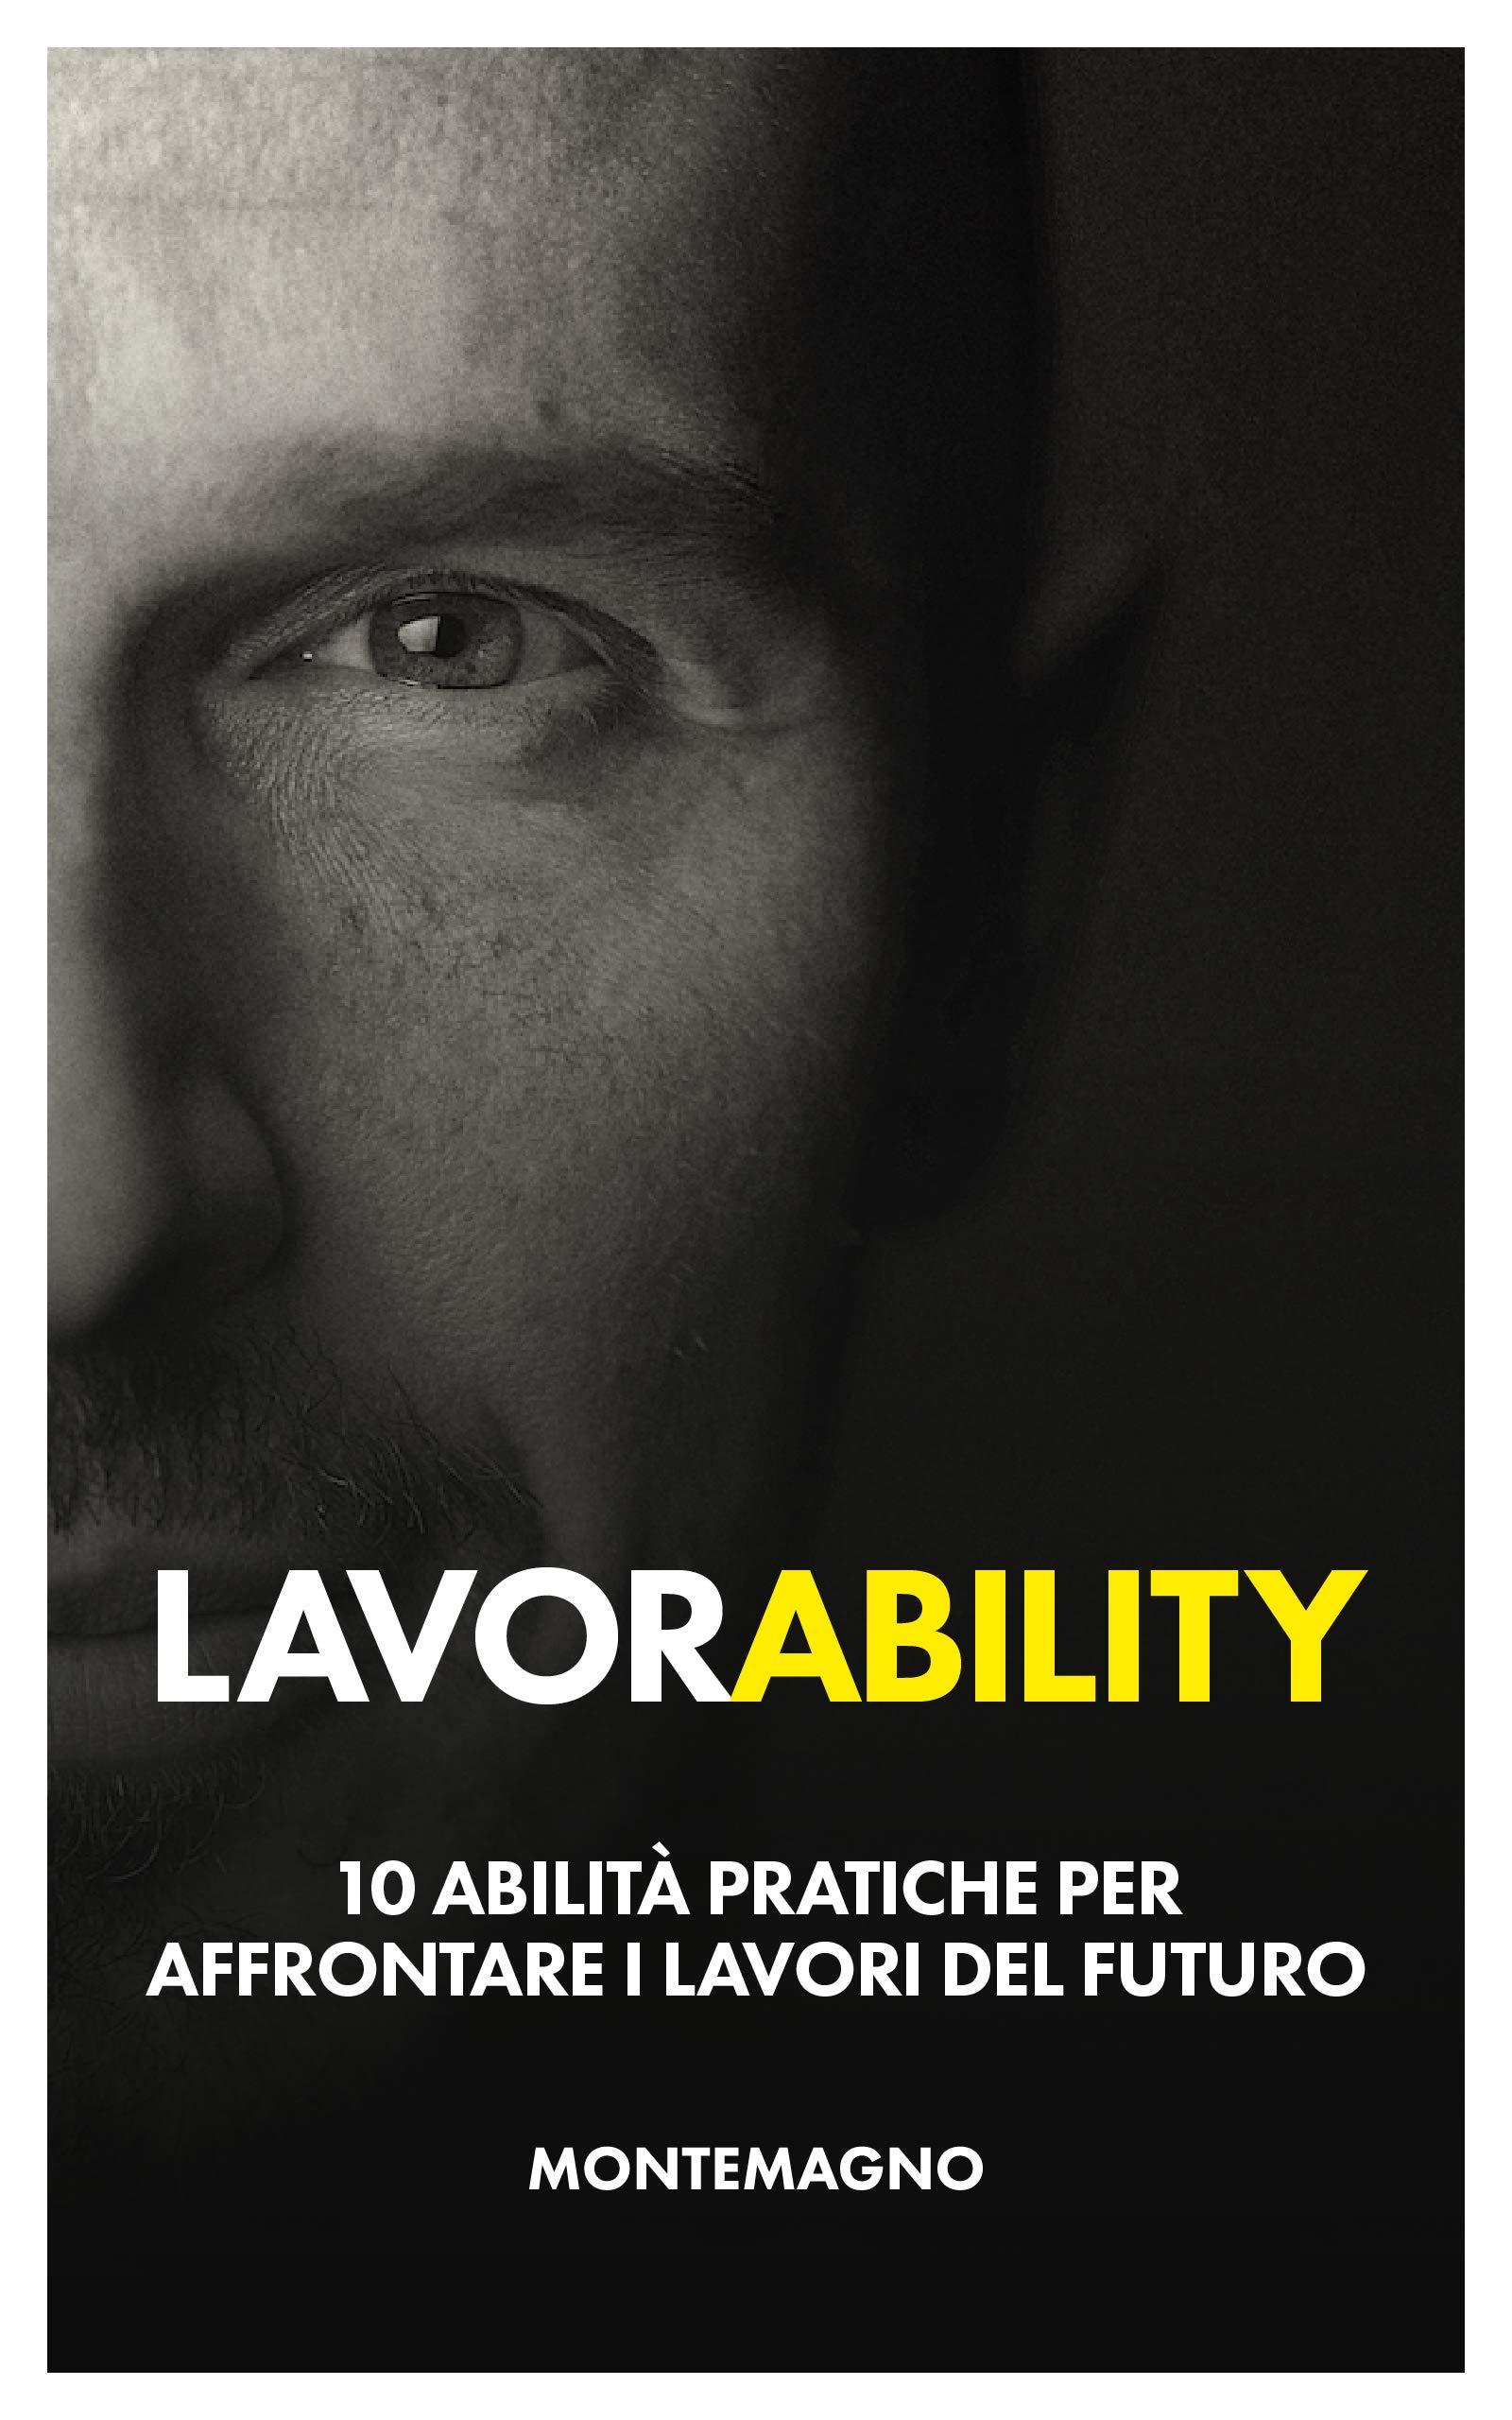 Marco Montemagno Lavorability